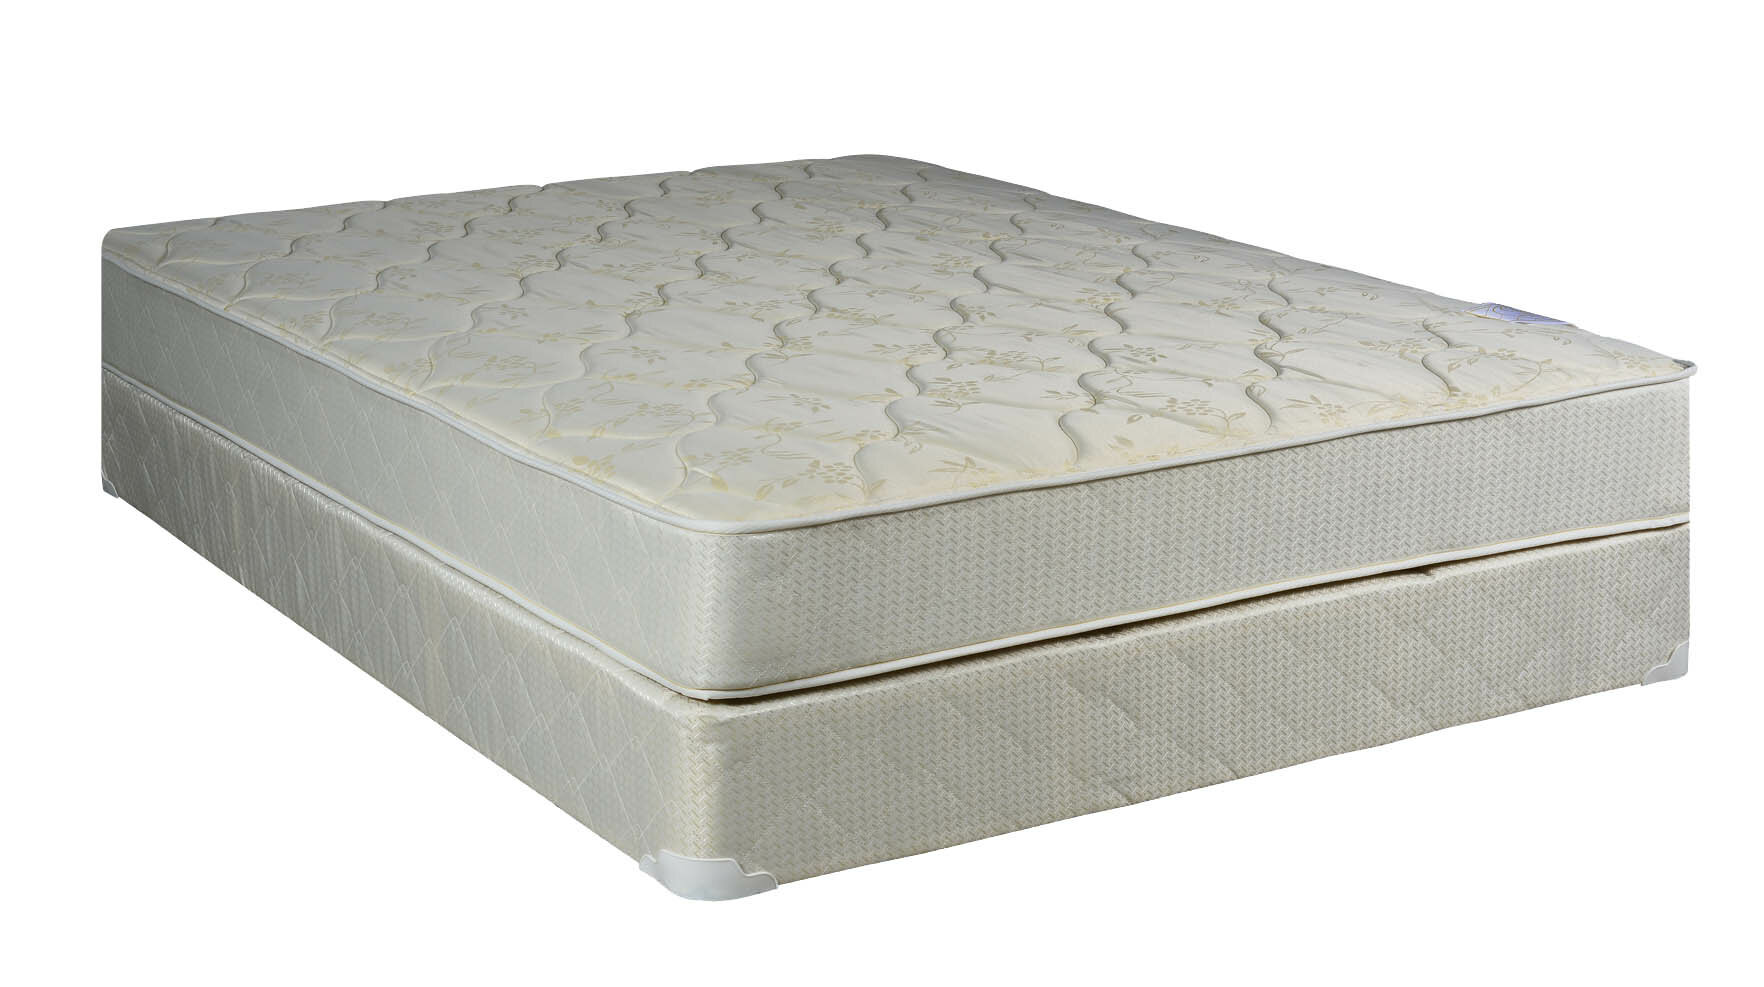 day futons queen coil xiorex full night futon innerspring mattress and seaside pocket